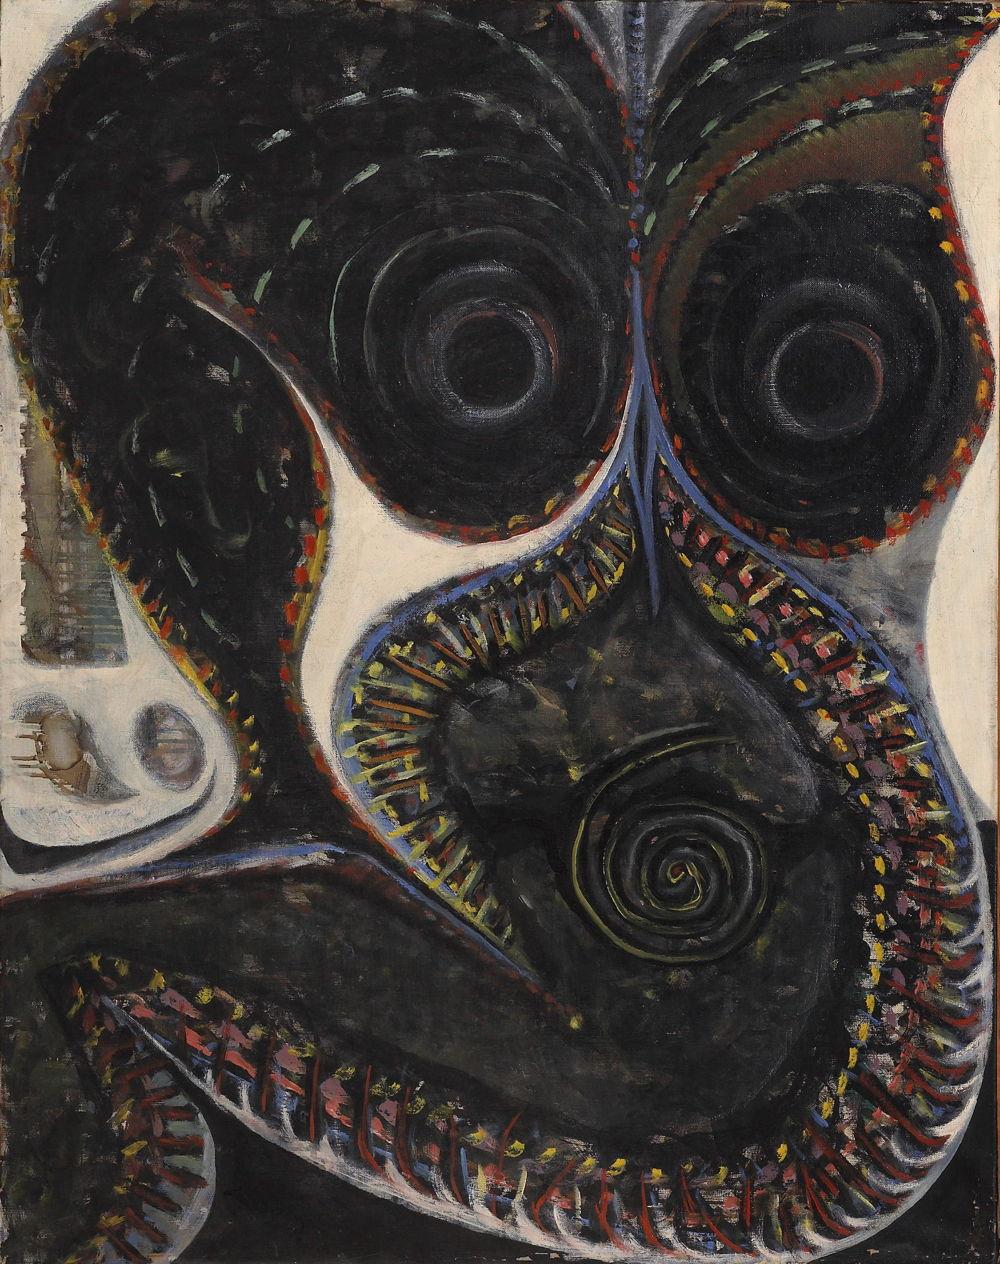 Работа «Barbelo» Жан-Жака Лебеля. 1955